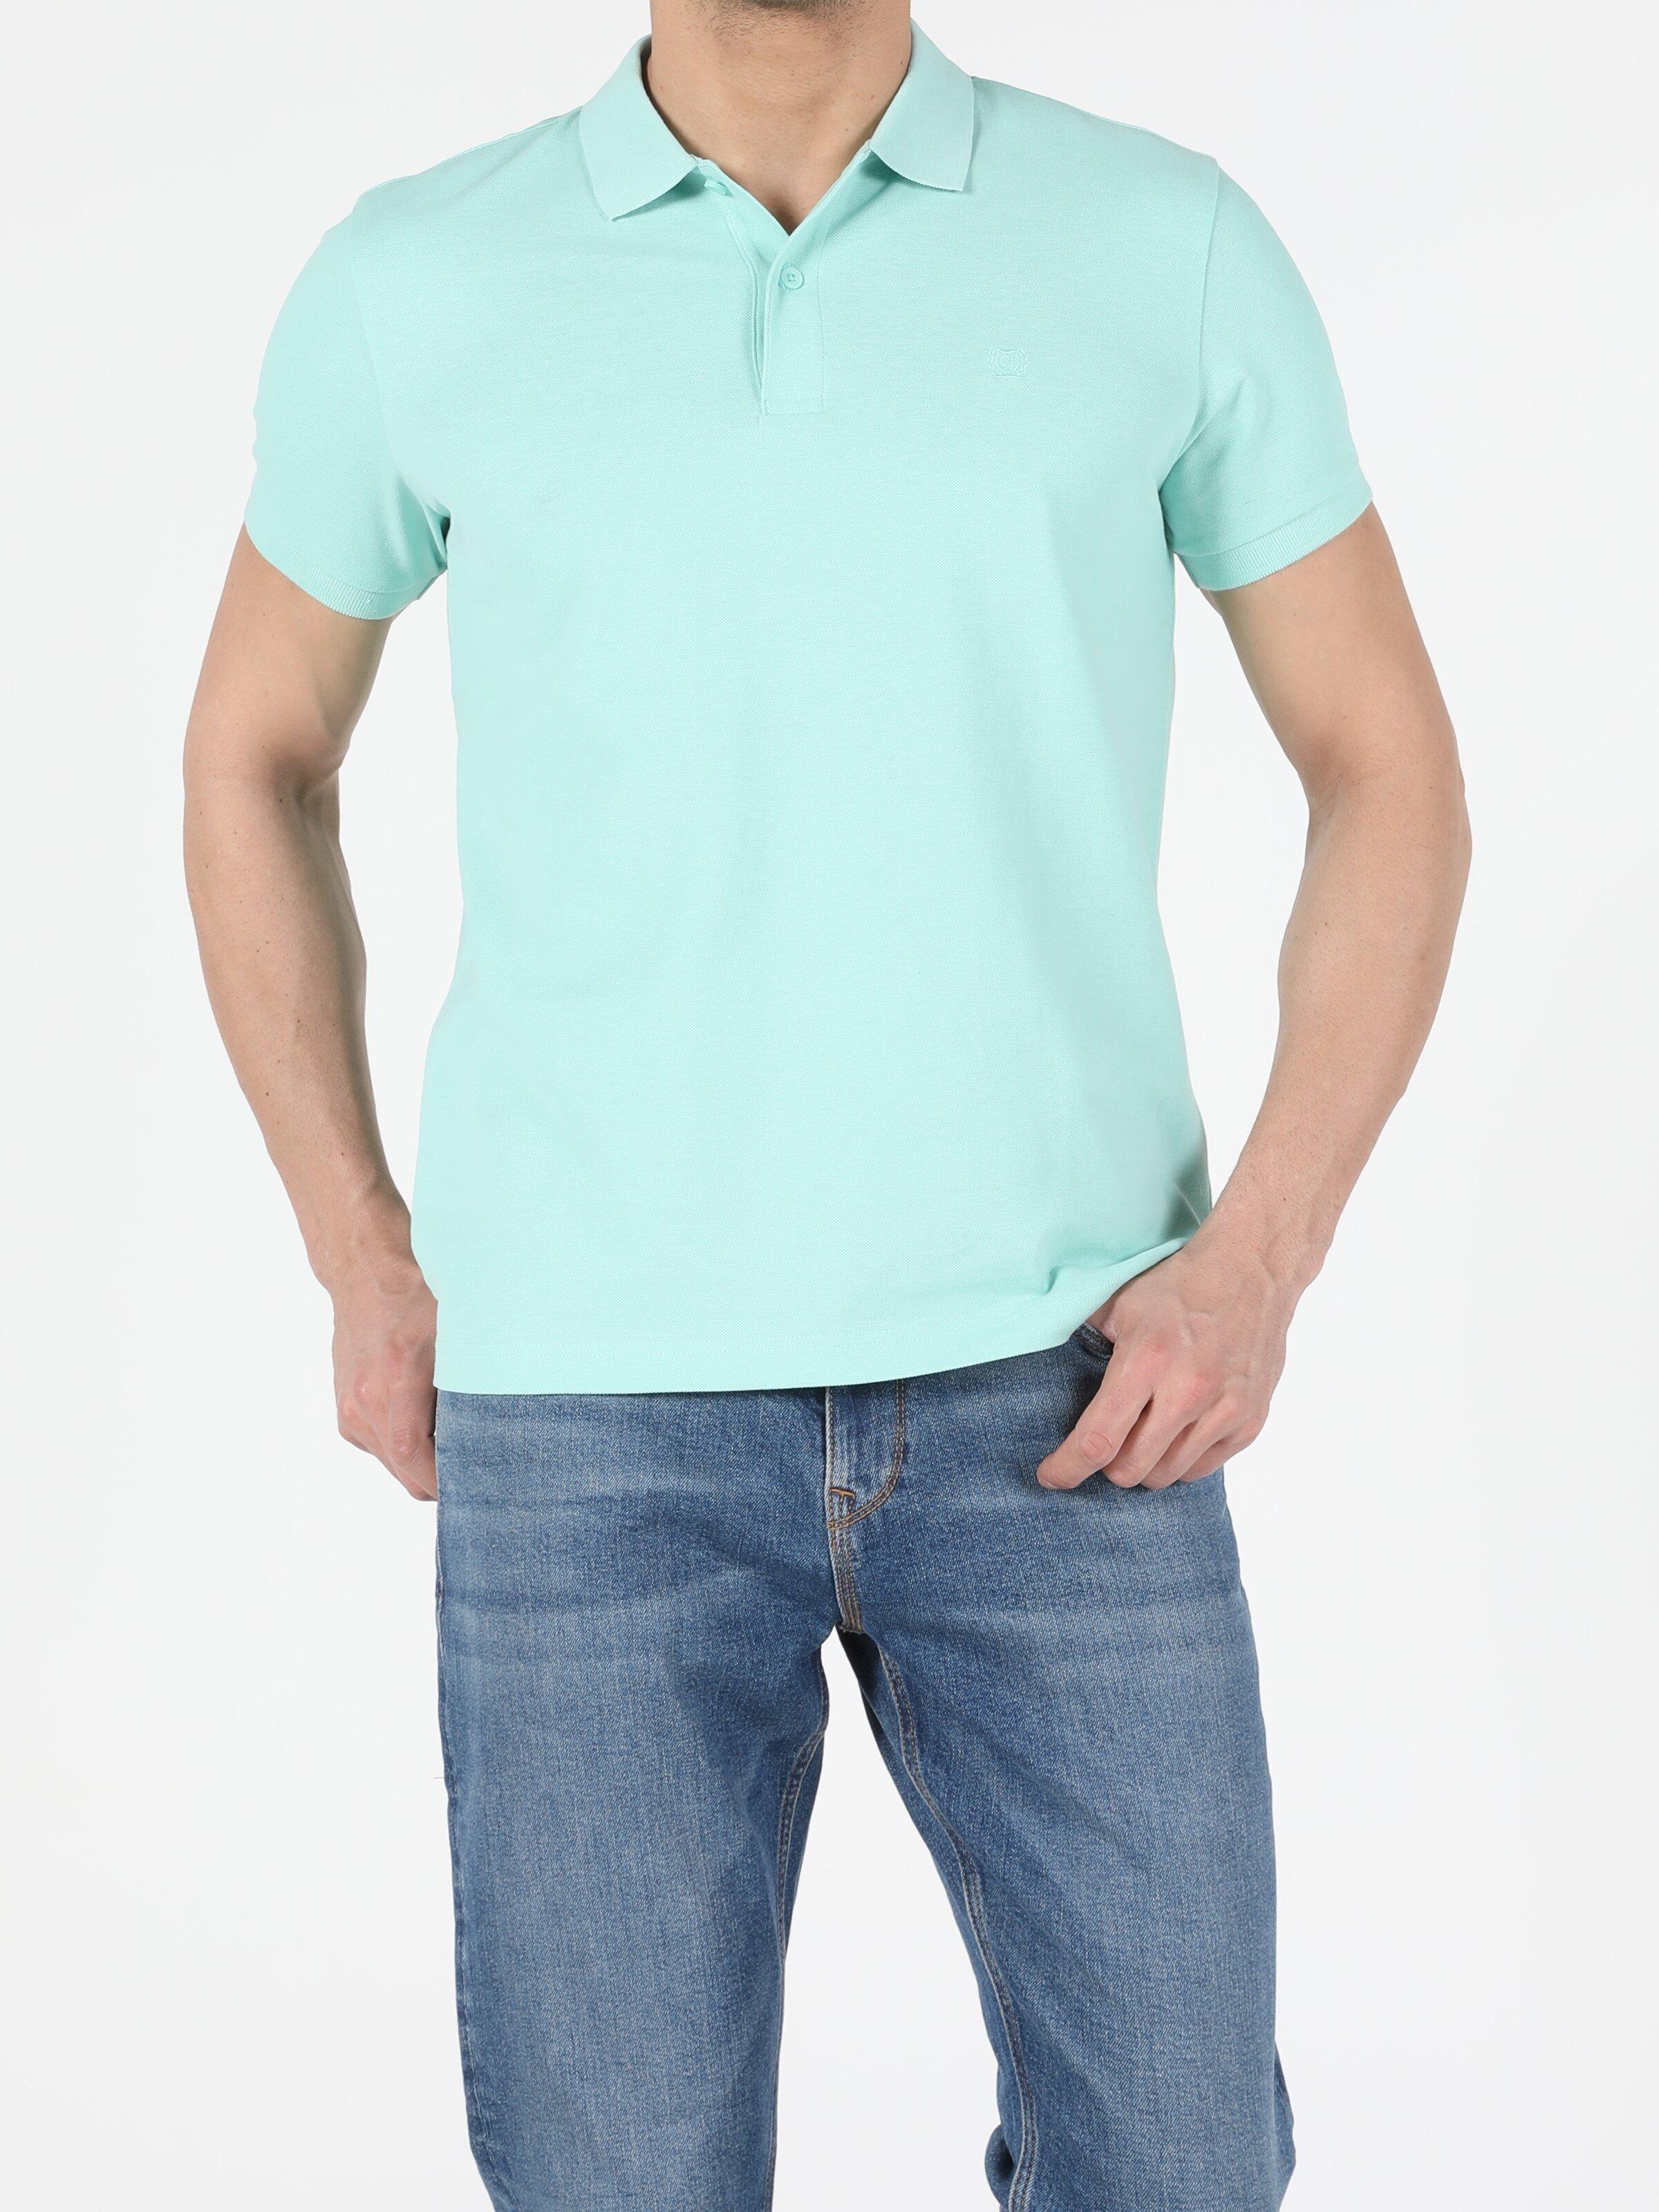 Regular Fit Polo Yaka Erkek Mint Yeşili Polo Kısa Kol